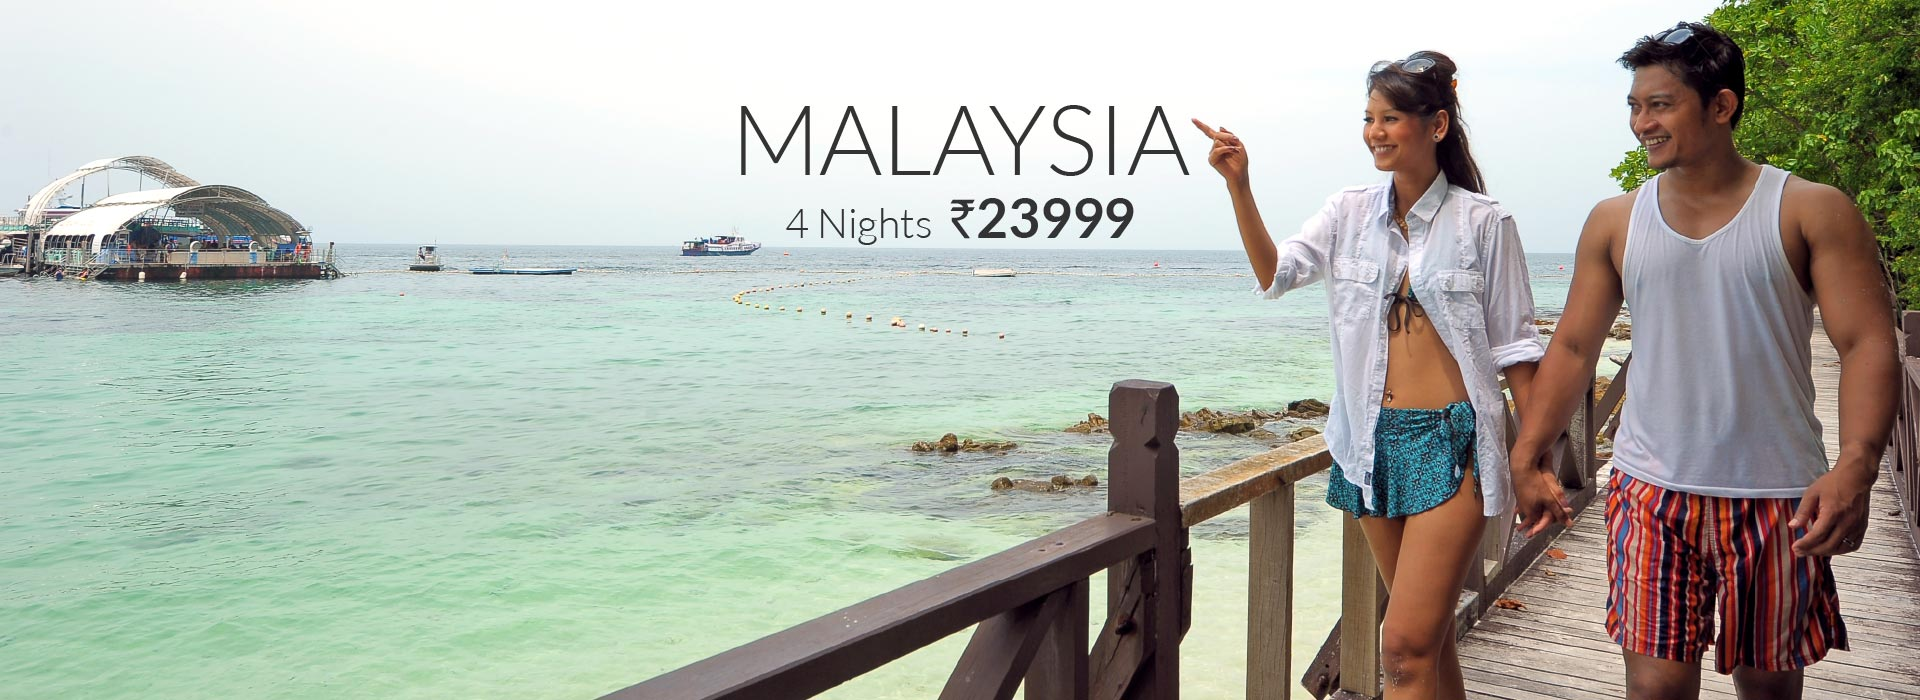 kuala lumpur holidays deal package dpauls travel. Black Bedroom Furniture Sets. Home Design Ideas